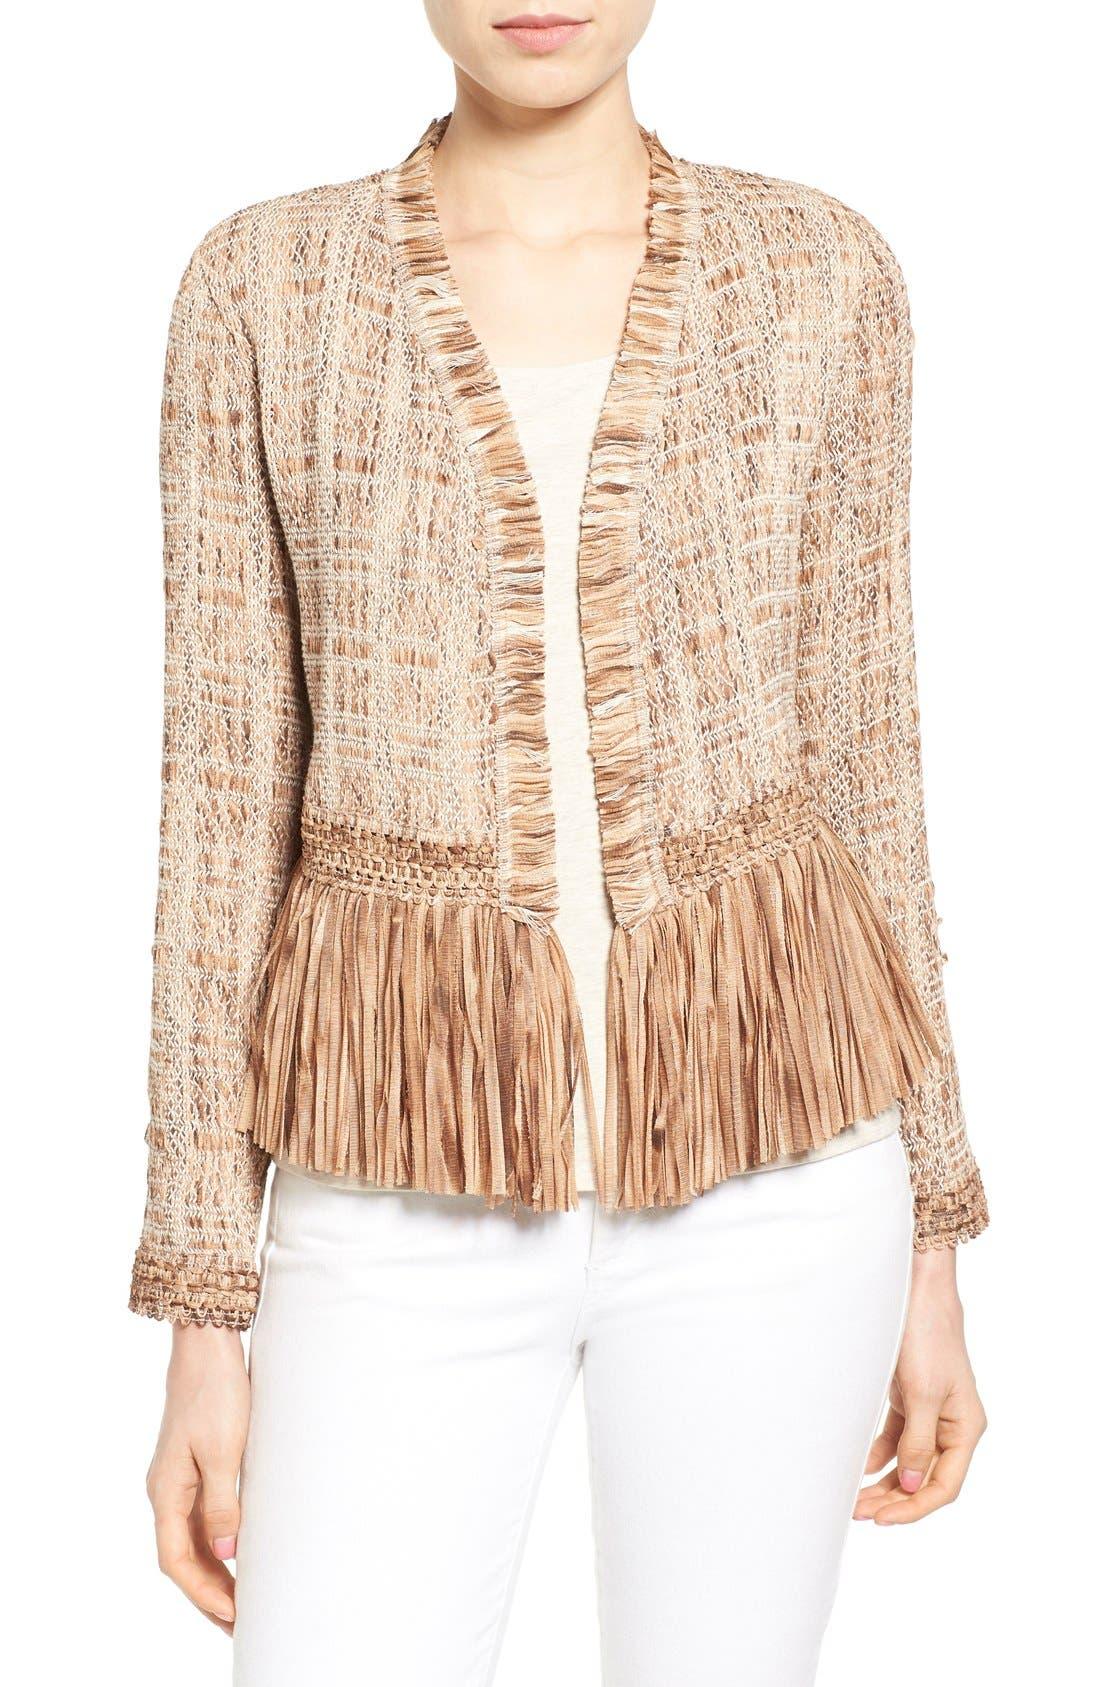 Alternate Image 1 Selected - NIC+ZOE 'Cork' Fringe Tweed Jacket (Regular & Petite)